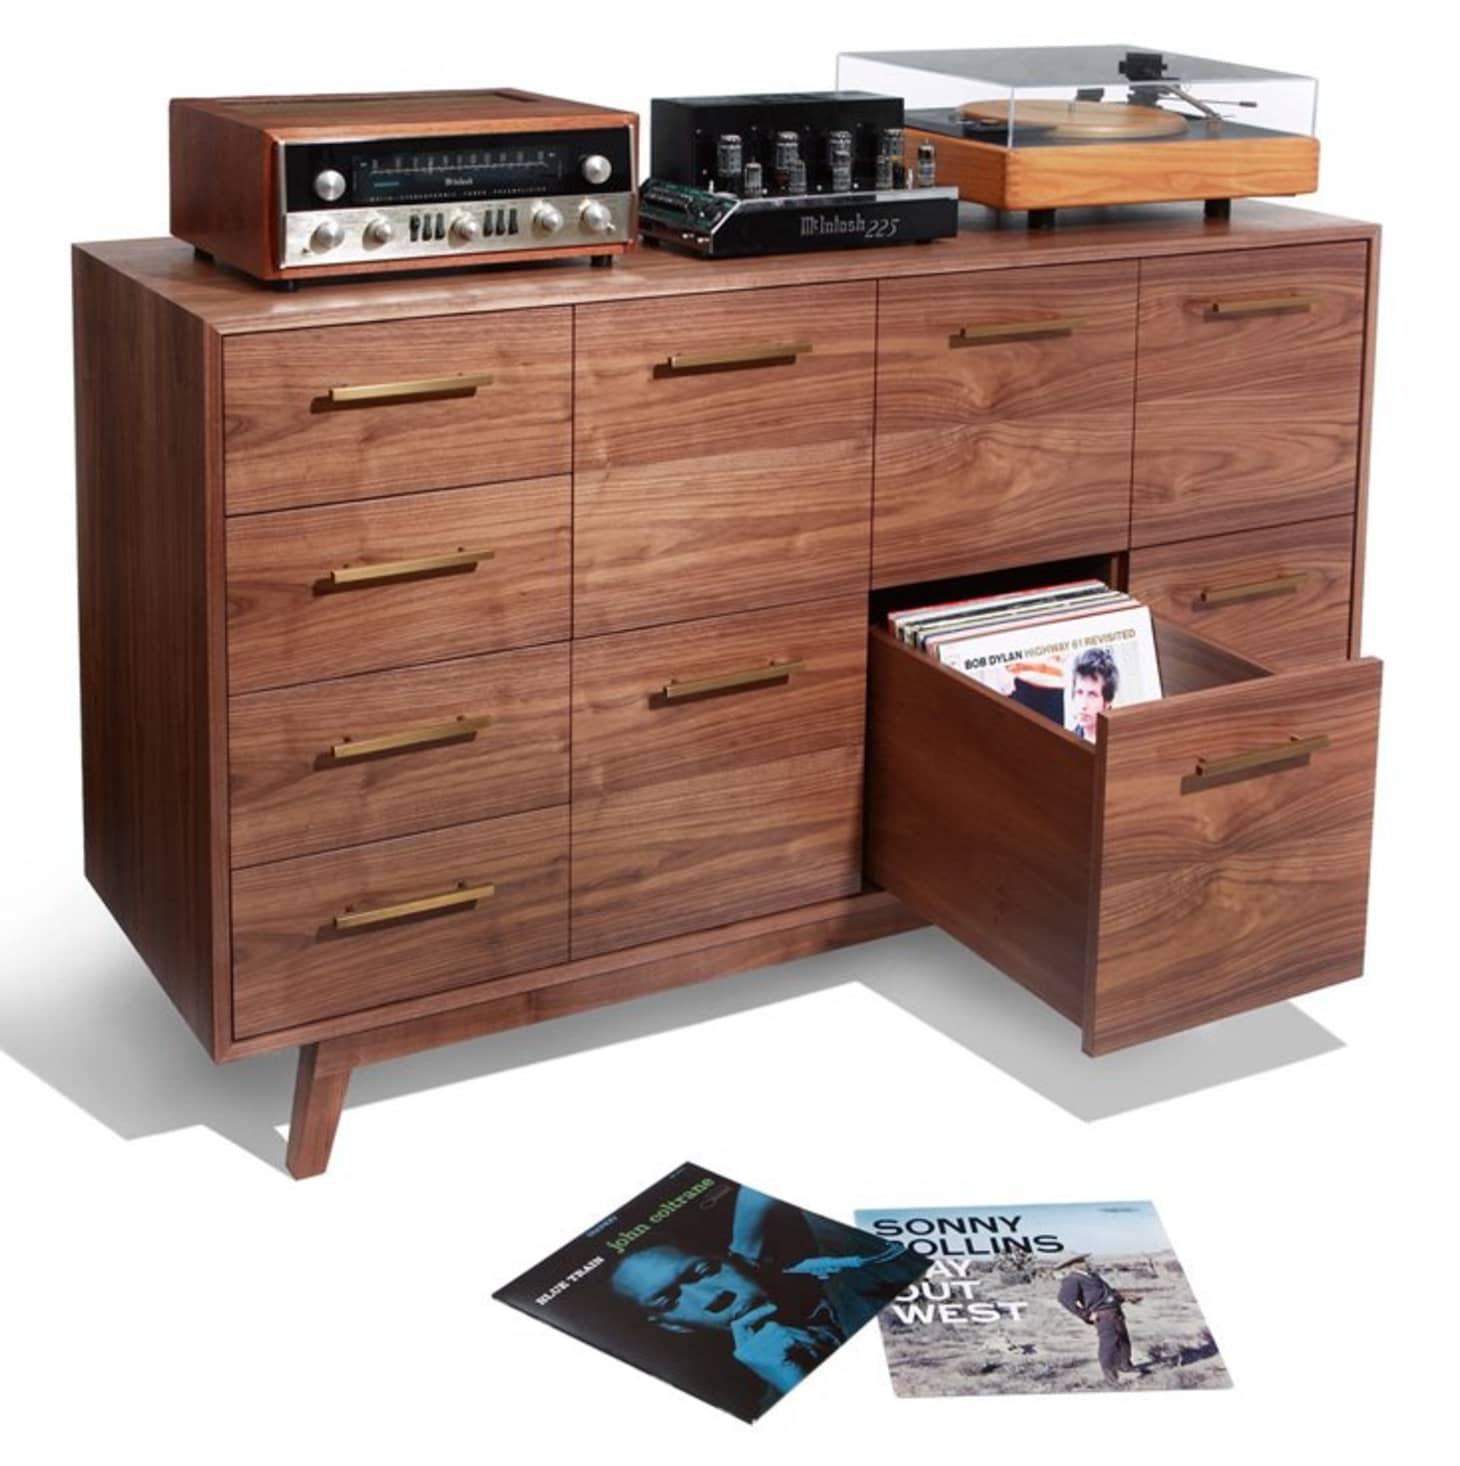 Brilliant Vinyl Record Storage 25 Best Storage Solutions Apartment Download Free Architecture Designs Scobabritishbridgeorg